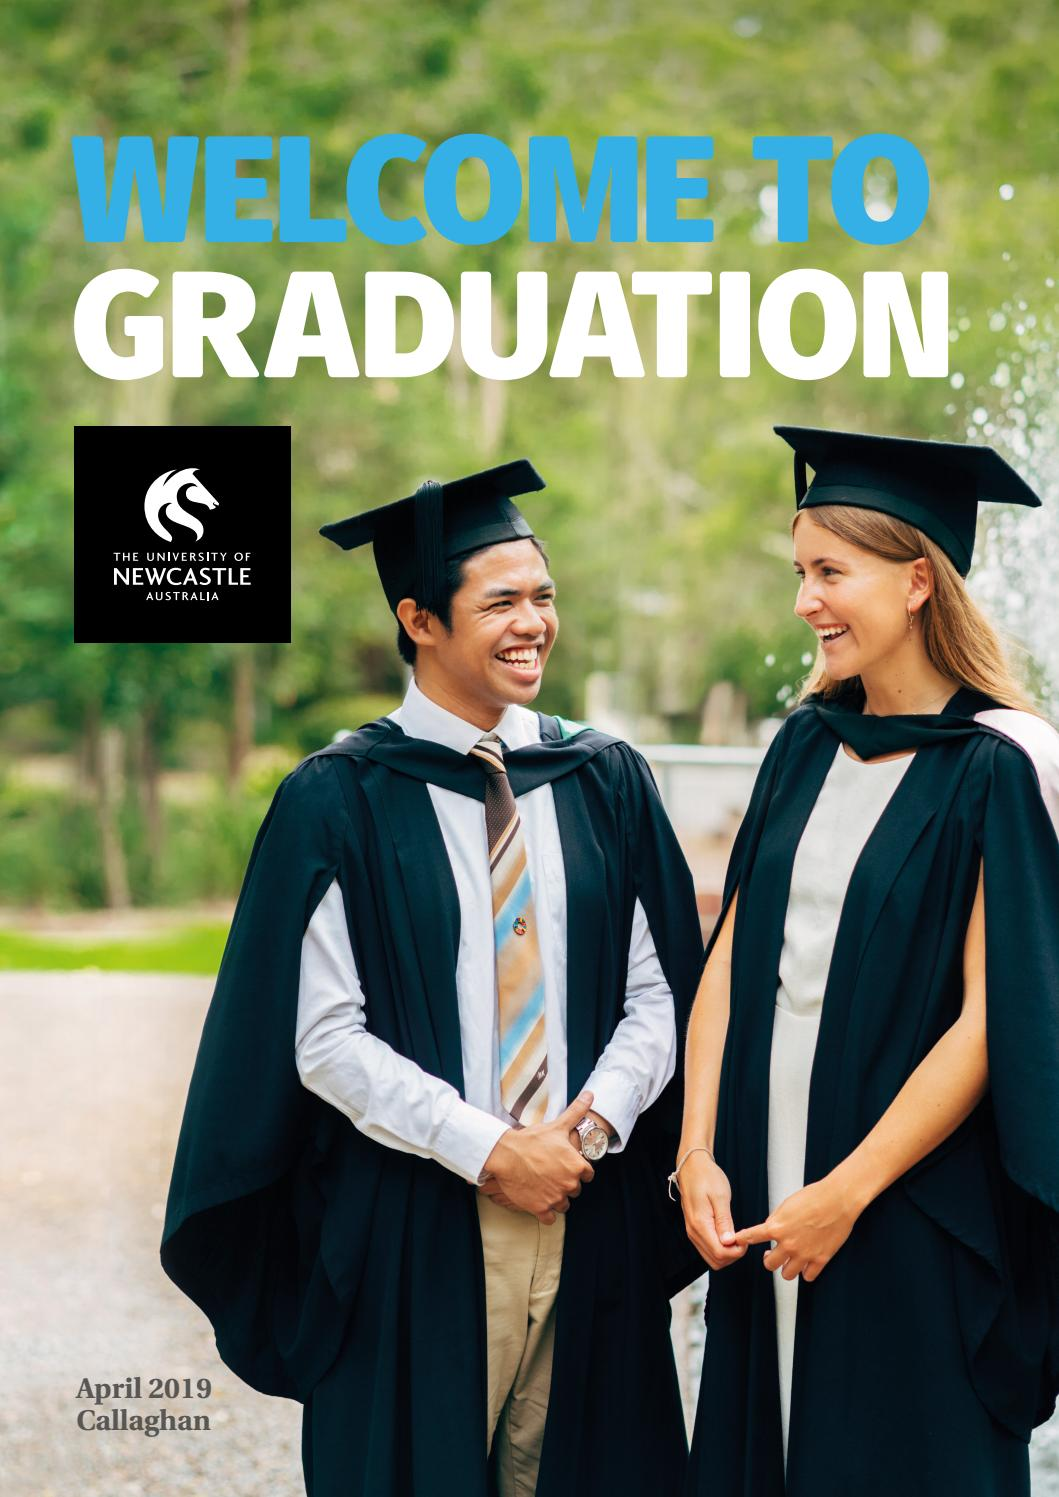 1bbd5d15b7 Callaghan Graduation Ceremonies - April 2019 by UON Graduation - issuu